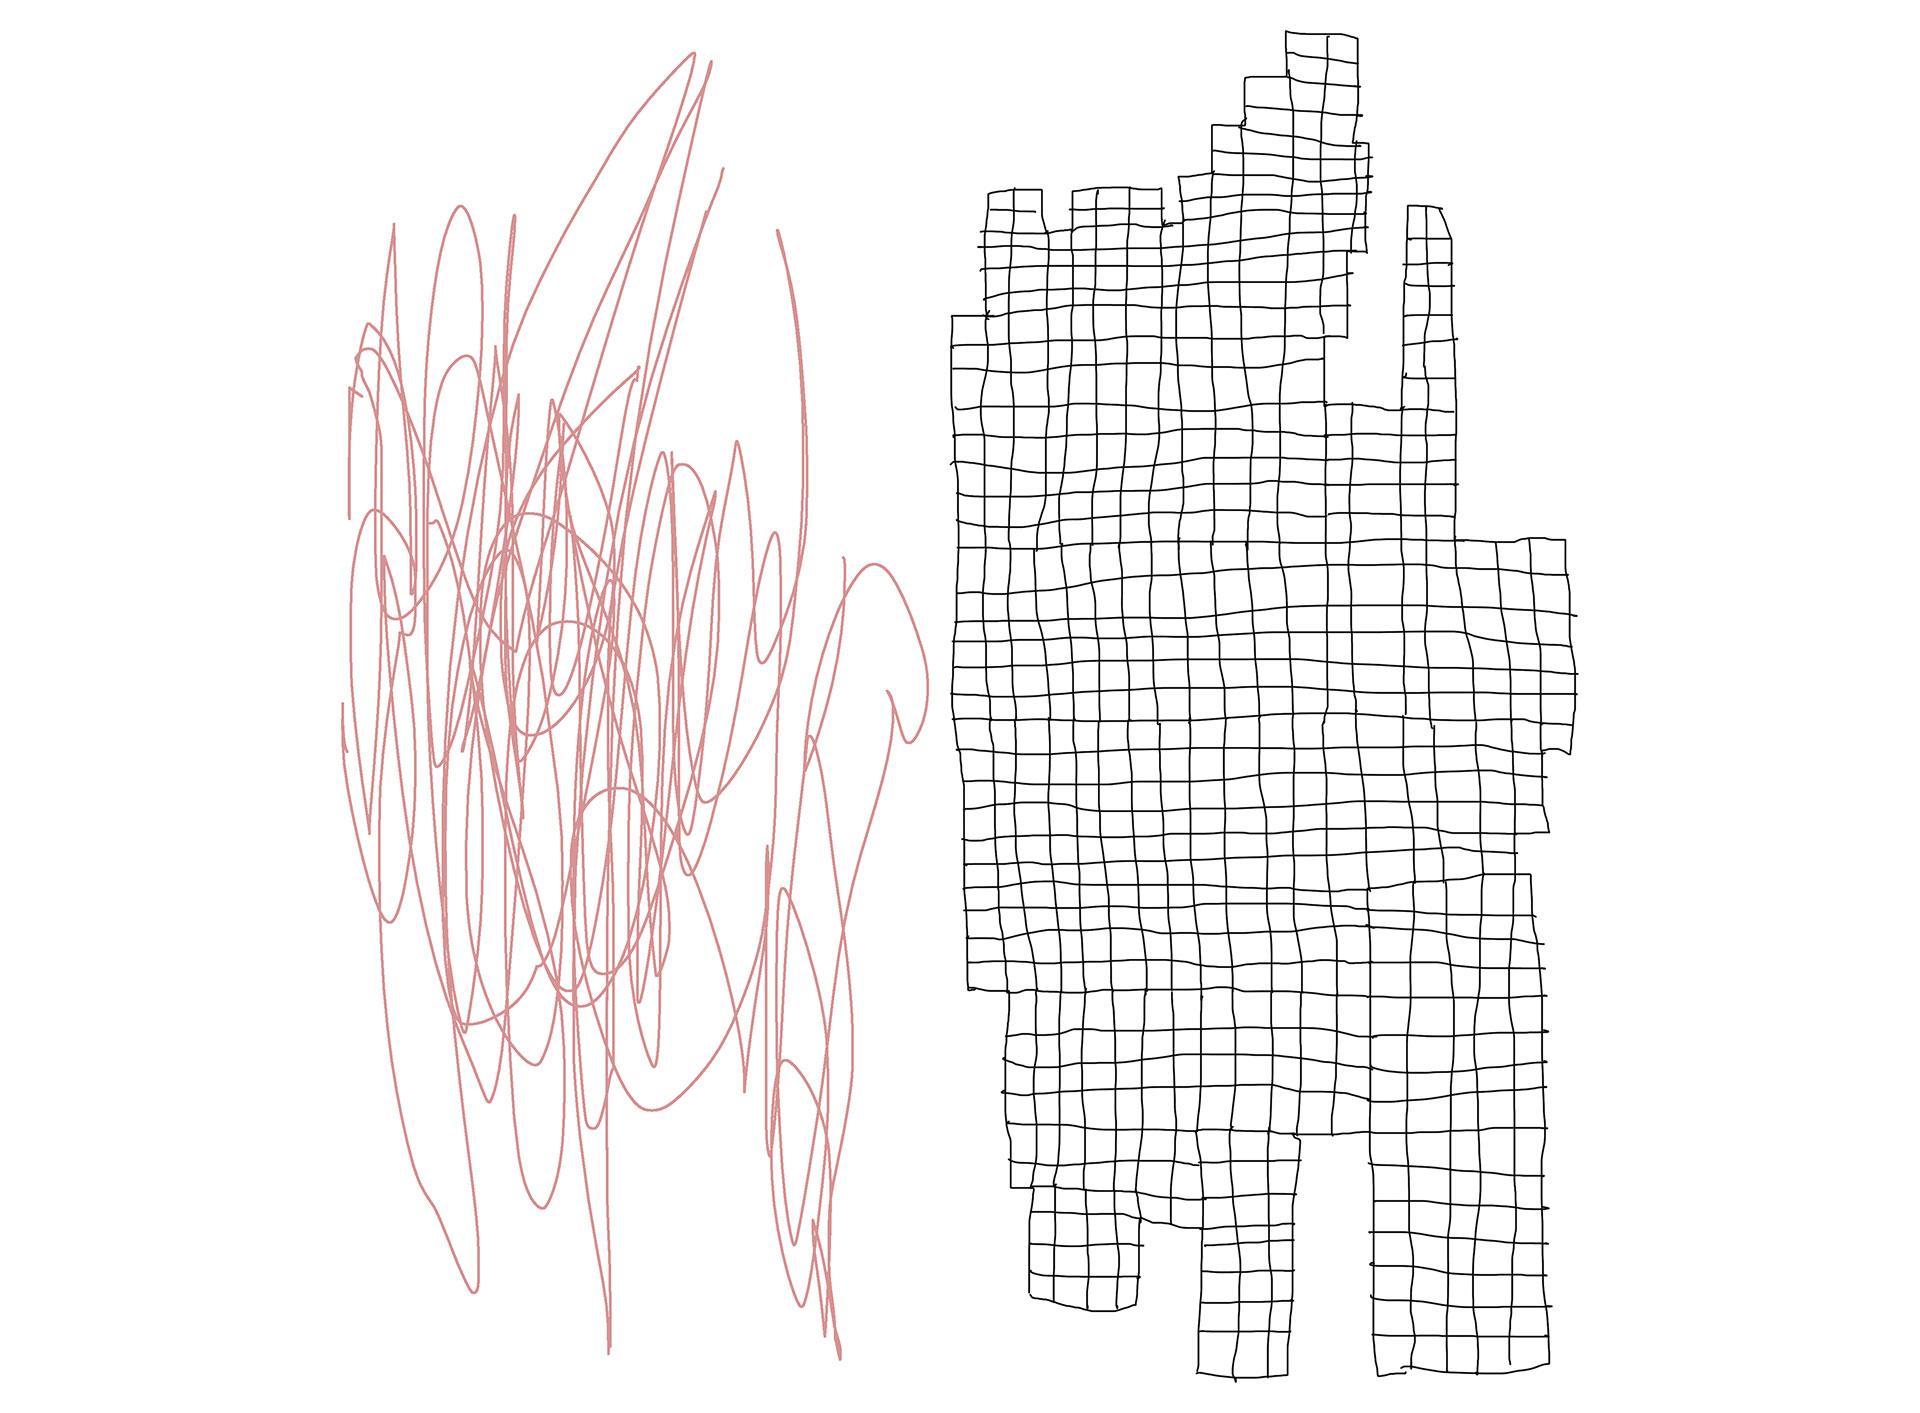 Maija Käyhkö: Digital Drawing